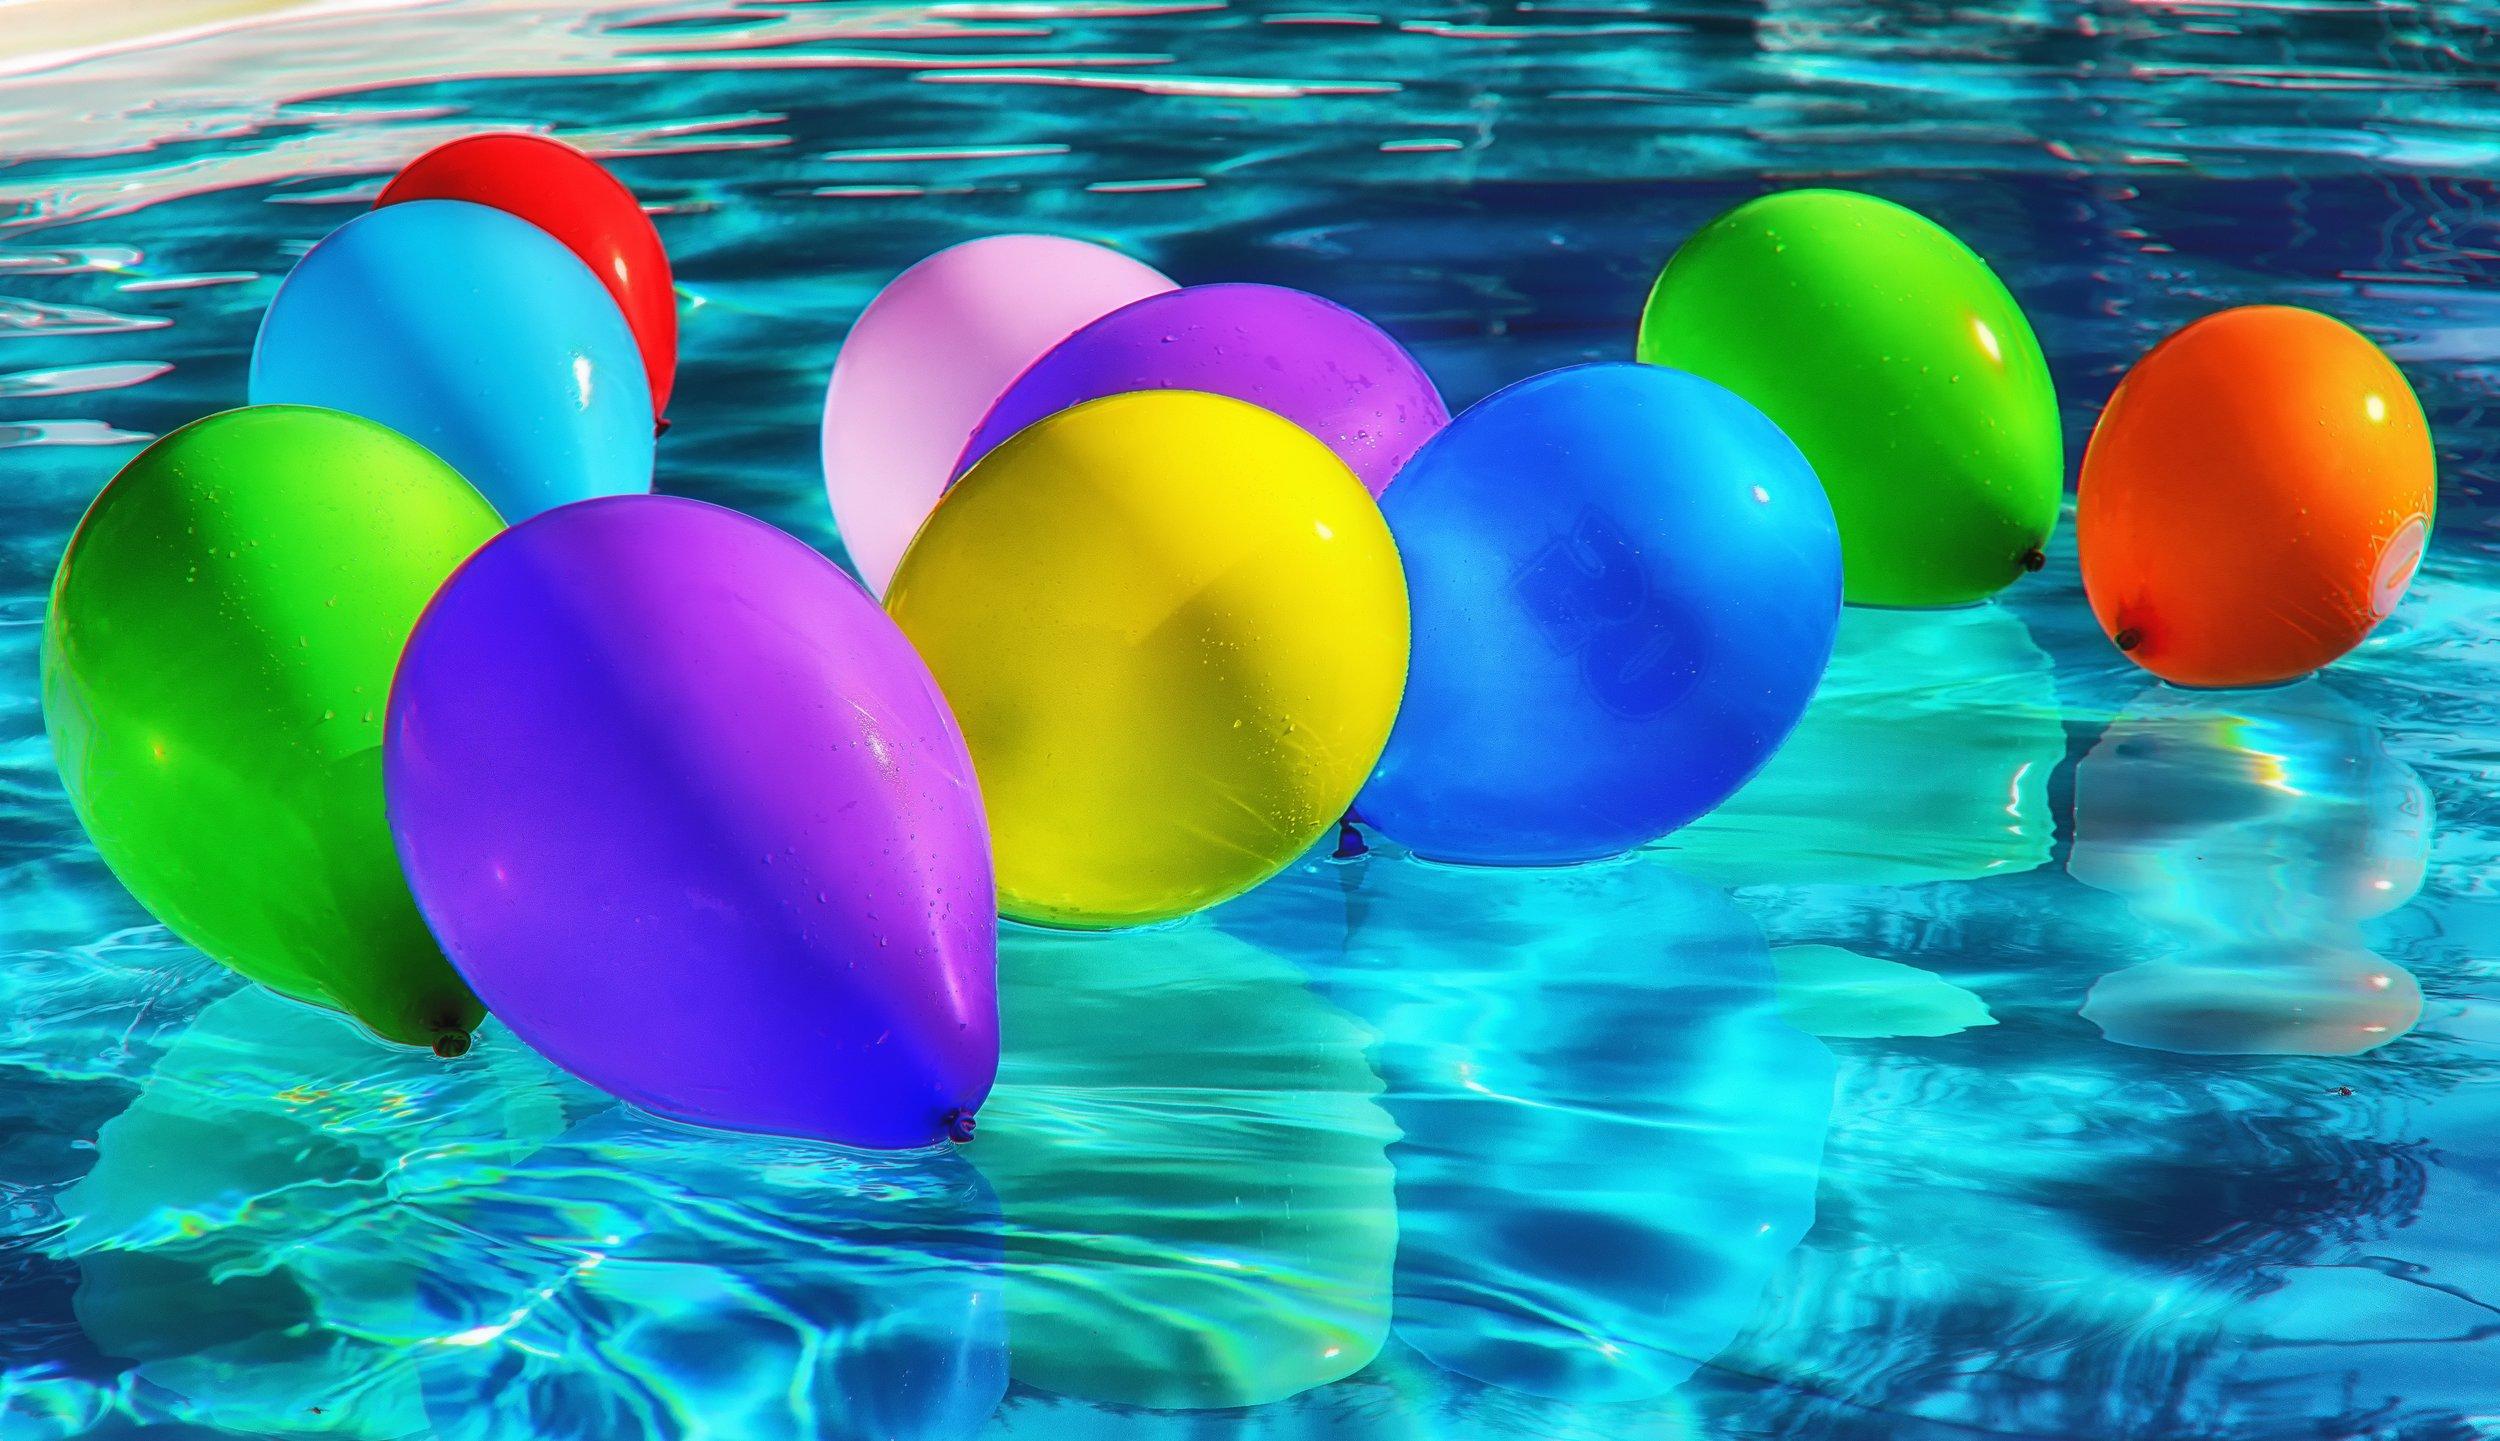 art-balloons-birthday-221361.jpg